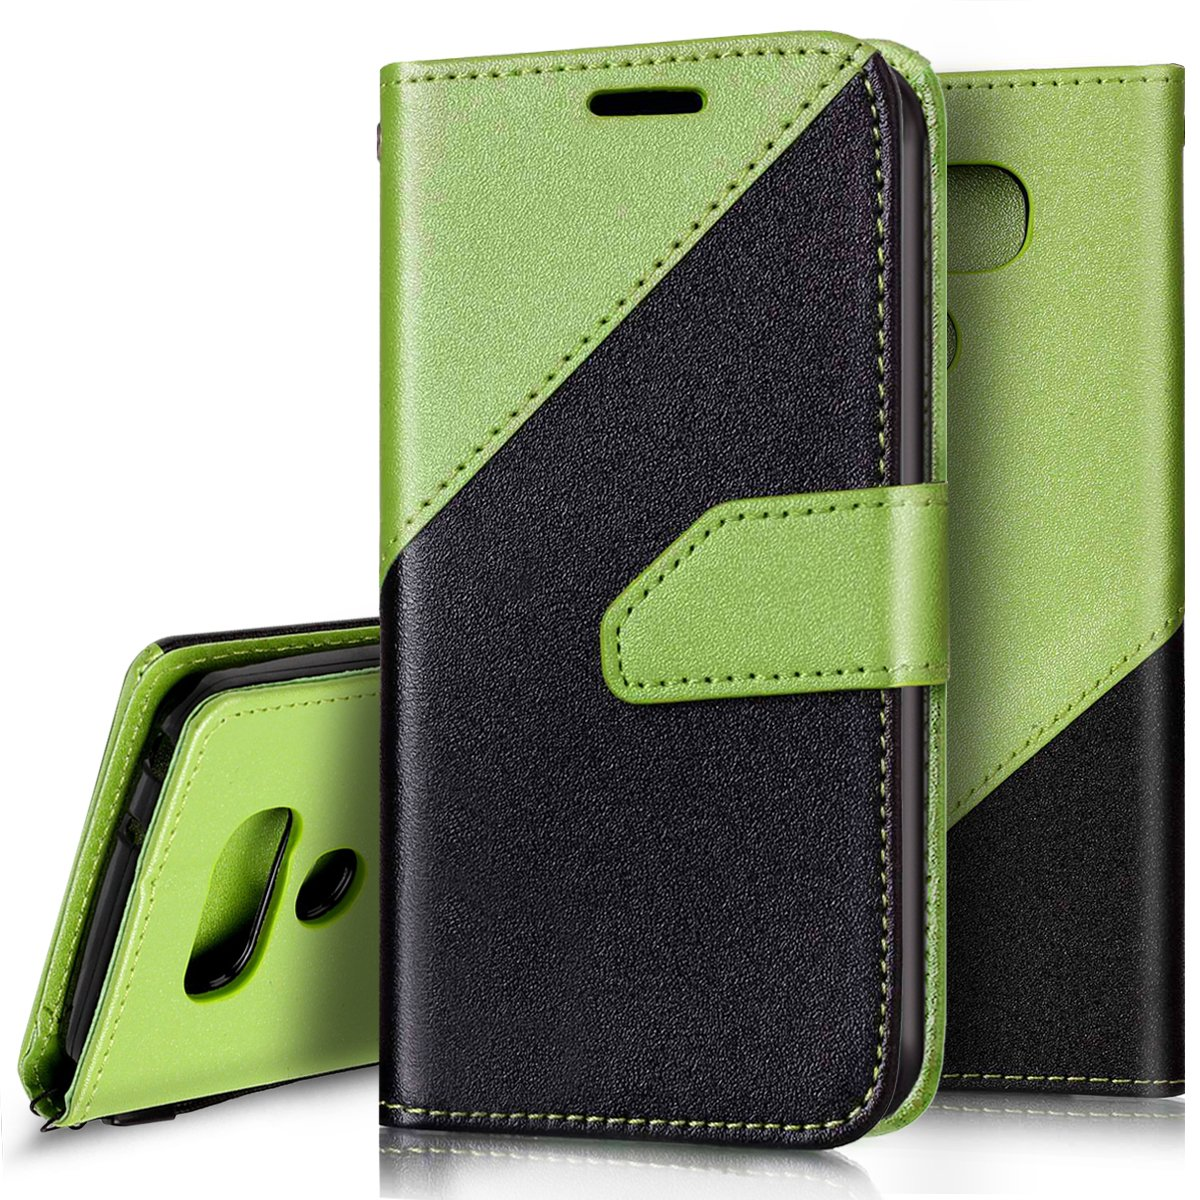 LG G6funda, LG G6funda tipo cartera, Ukayfe elegante mate dos colores diseño Premium de piel sintética tipo libro con tapa protectora funda con ranuras para tarjetas para LG G6, Ukayfe0124100